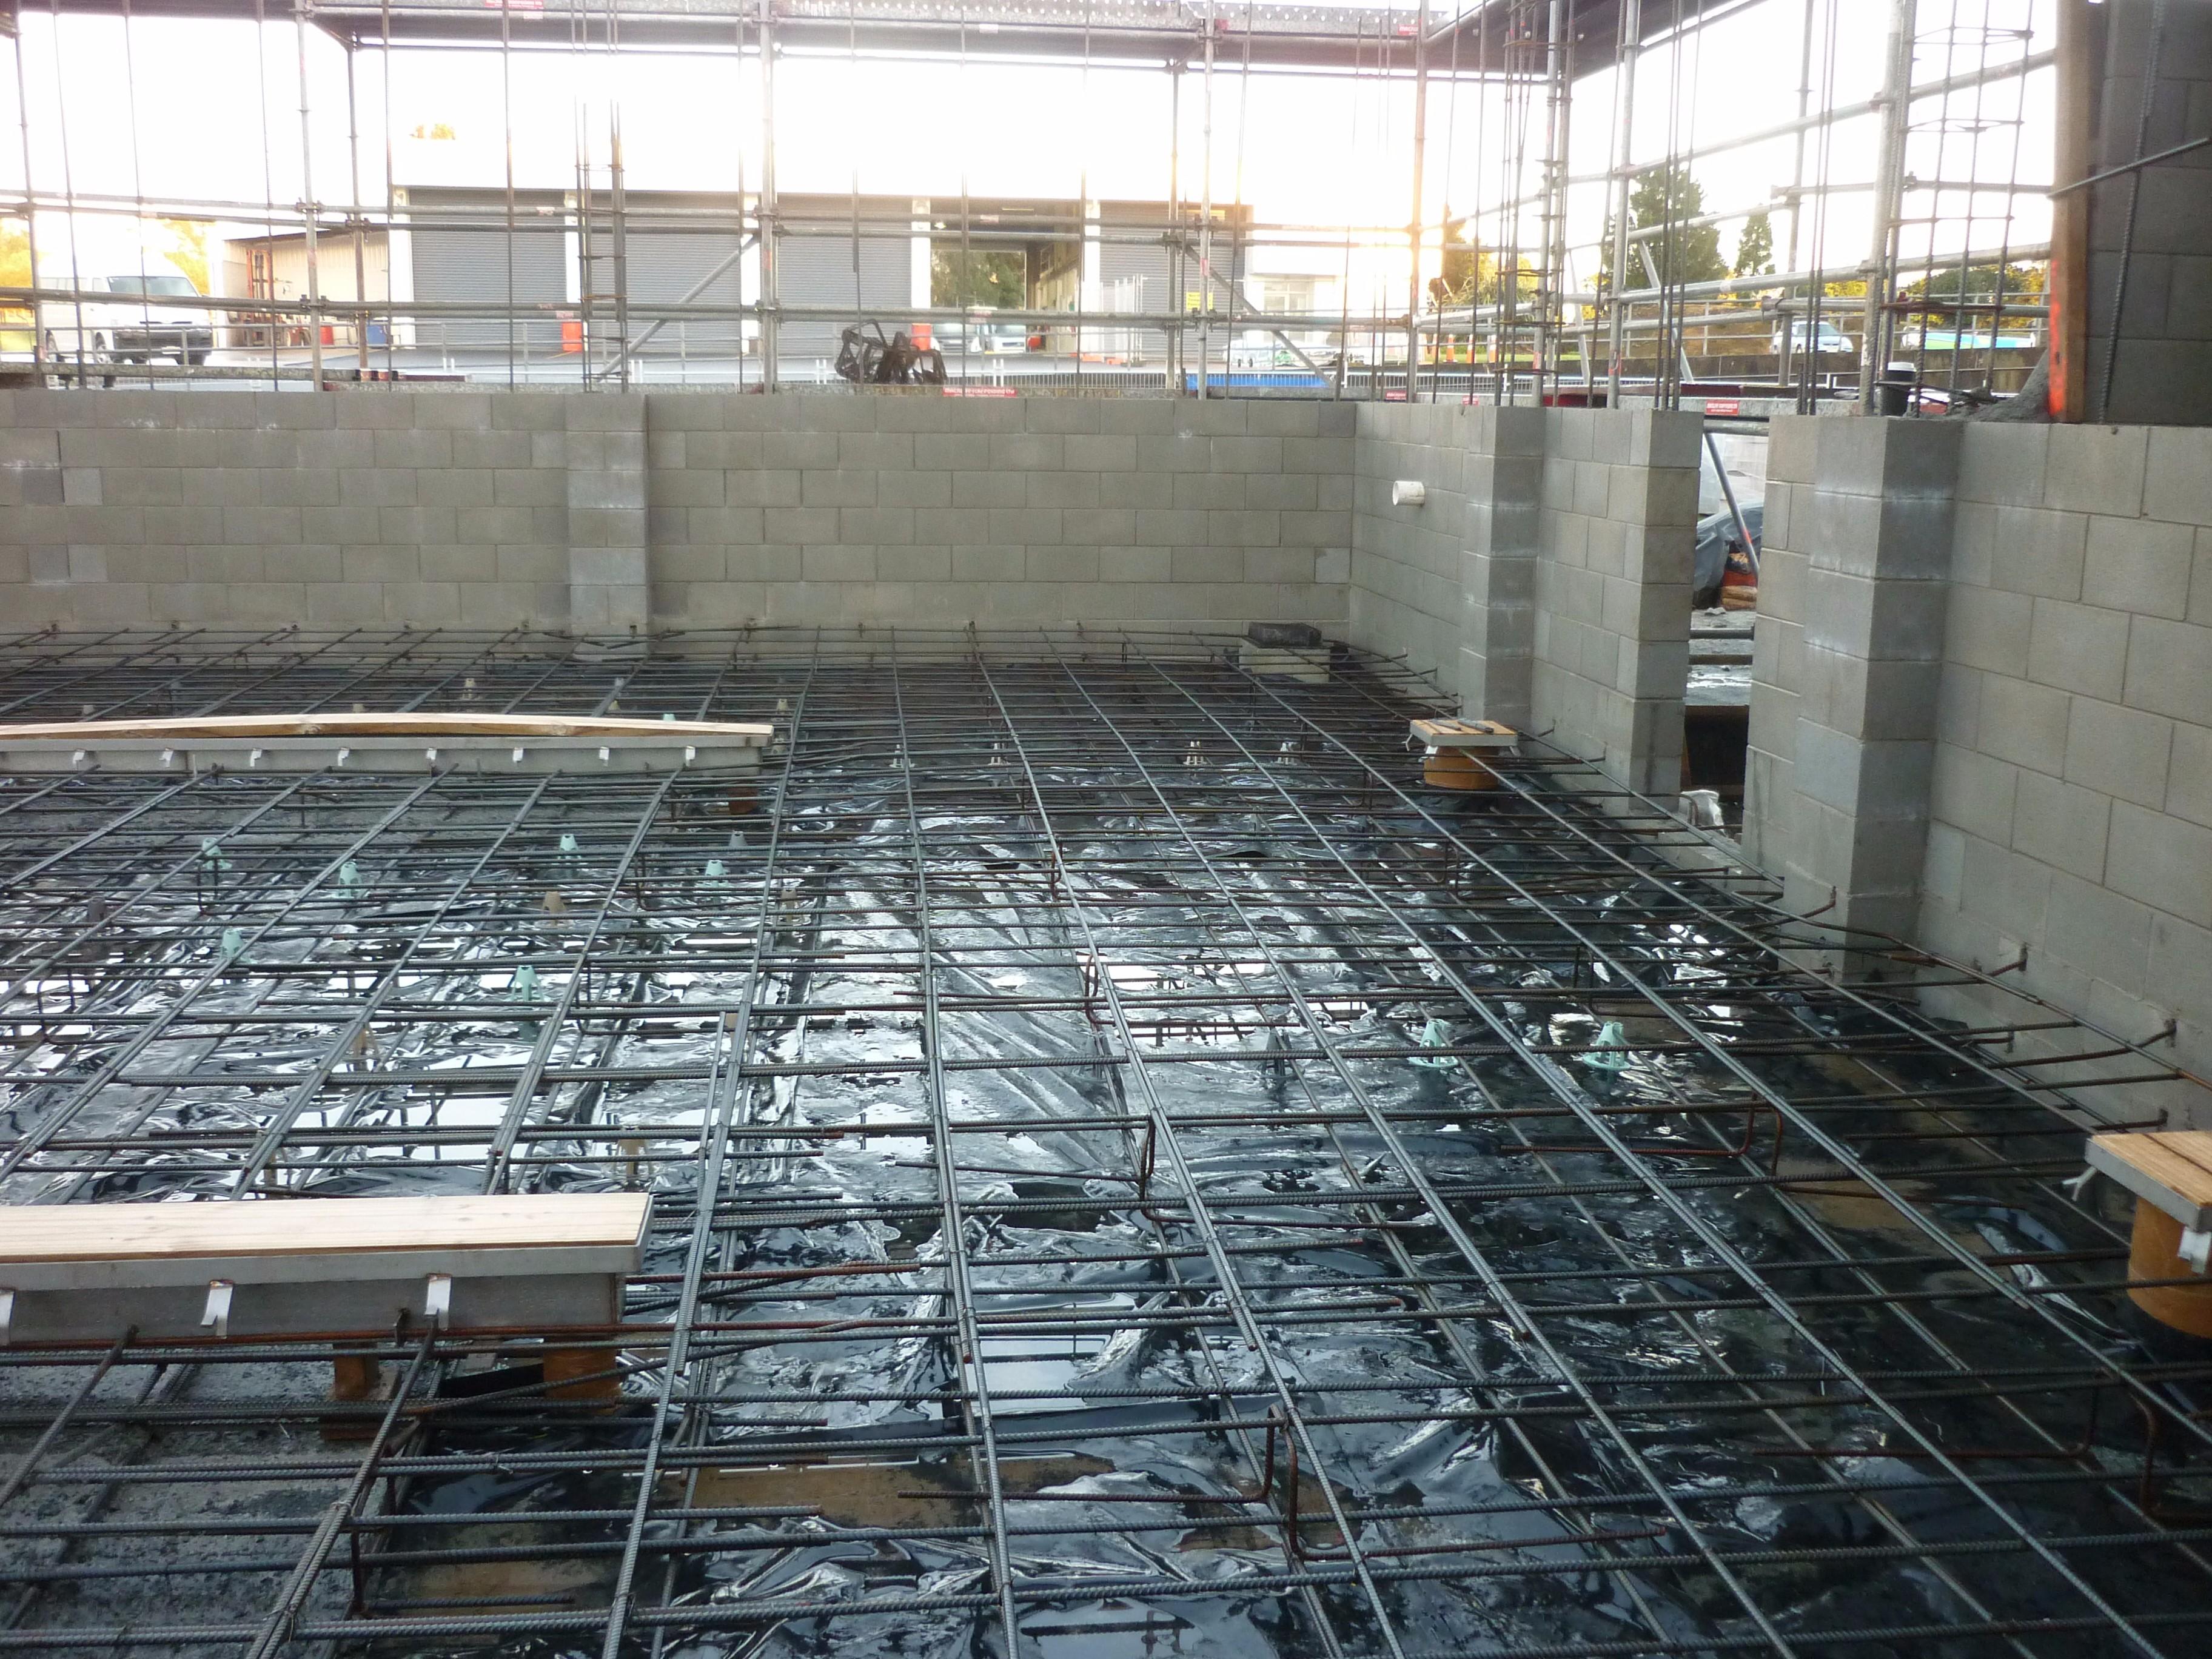 Steve Bowling Reinforced Concrete